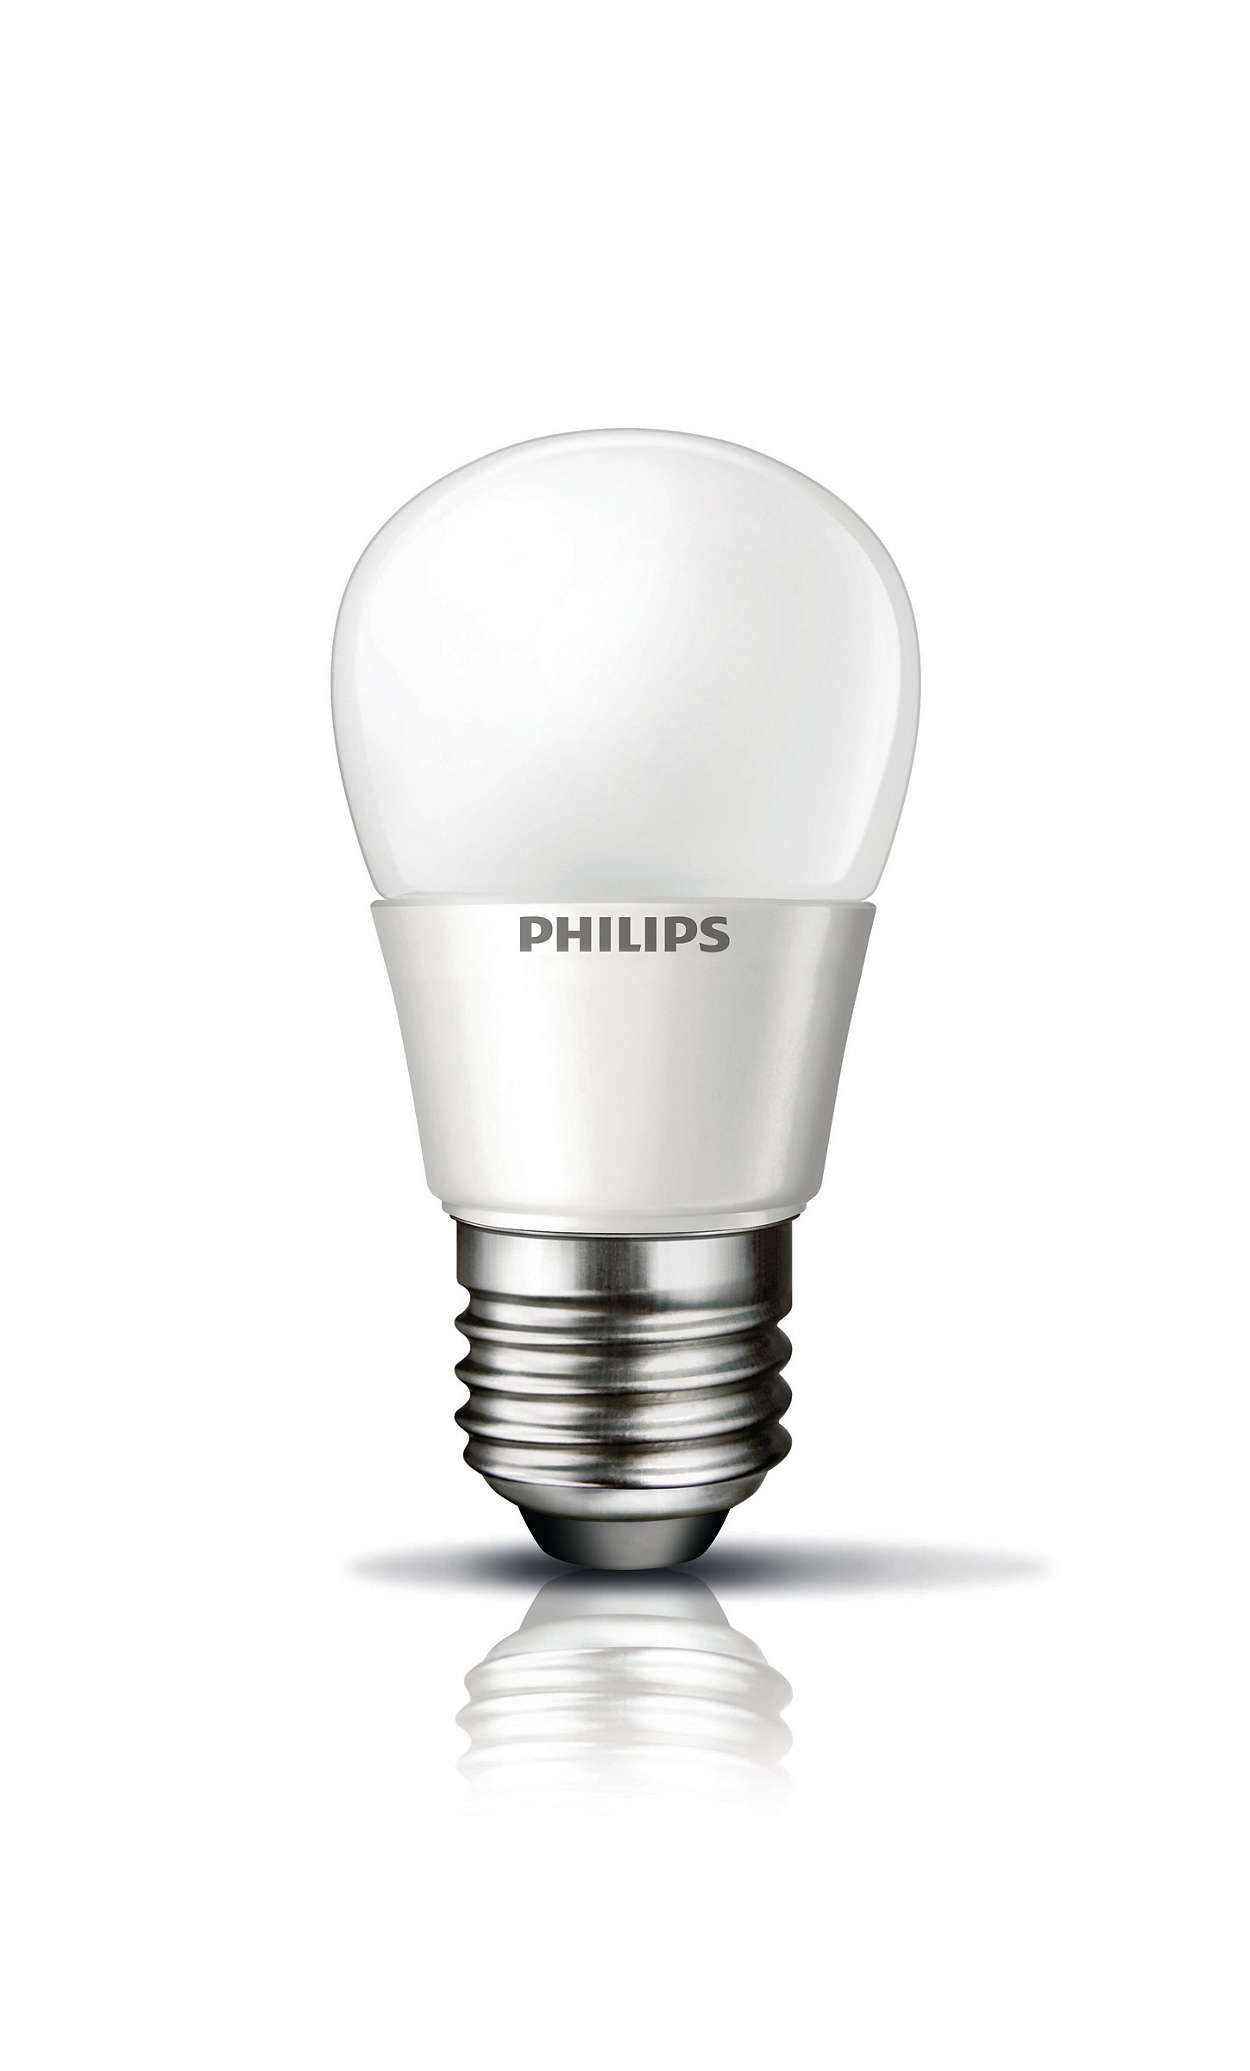 Ušteda energije bez kompromisa